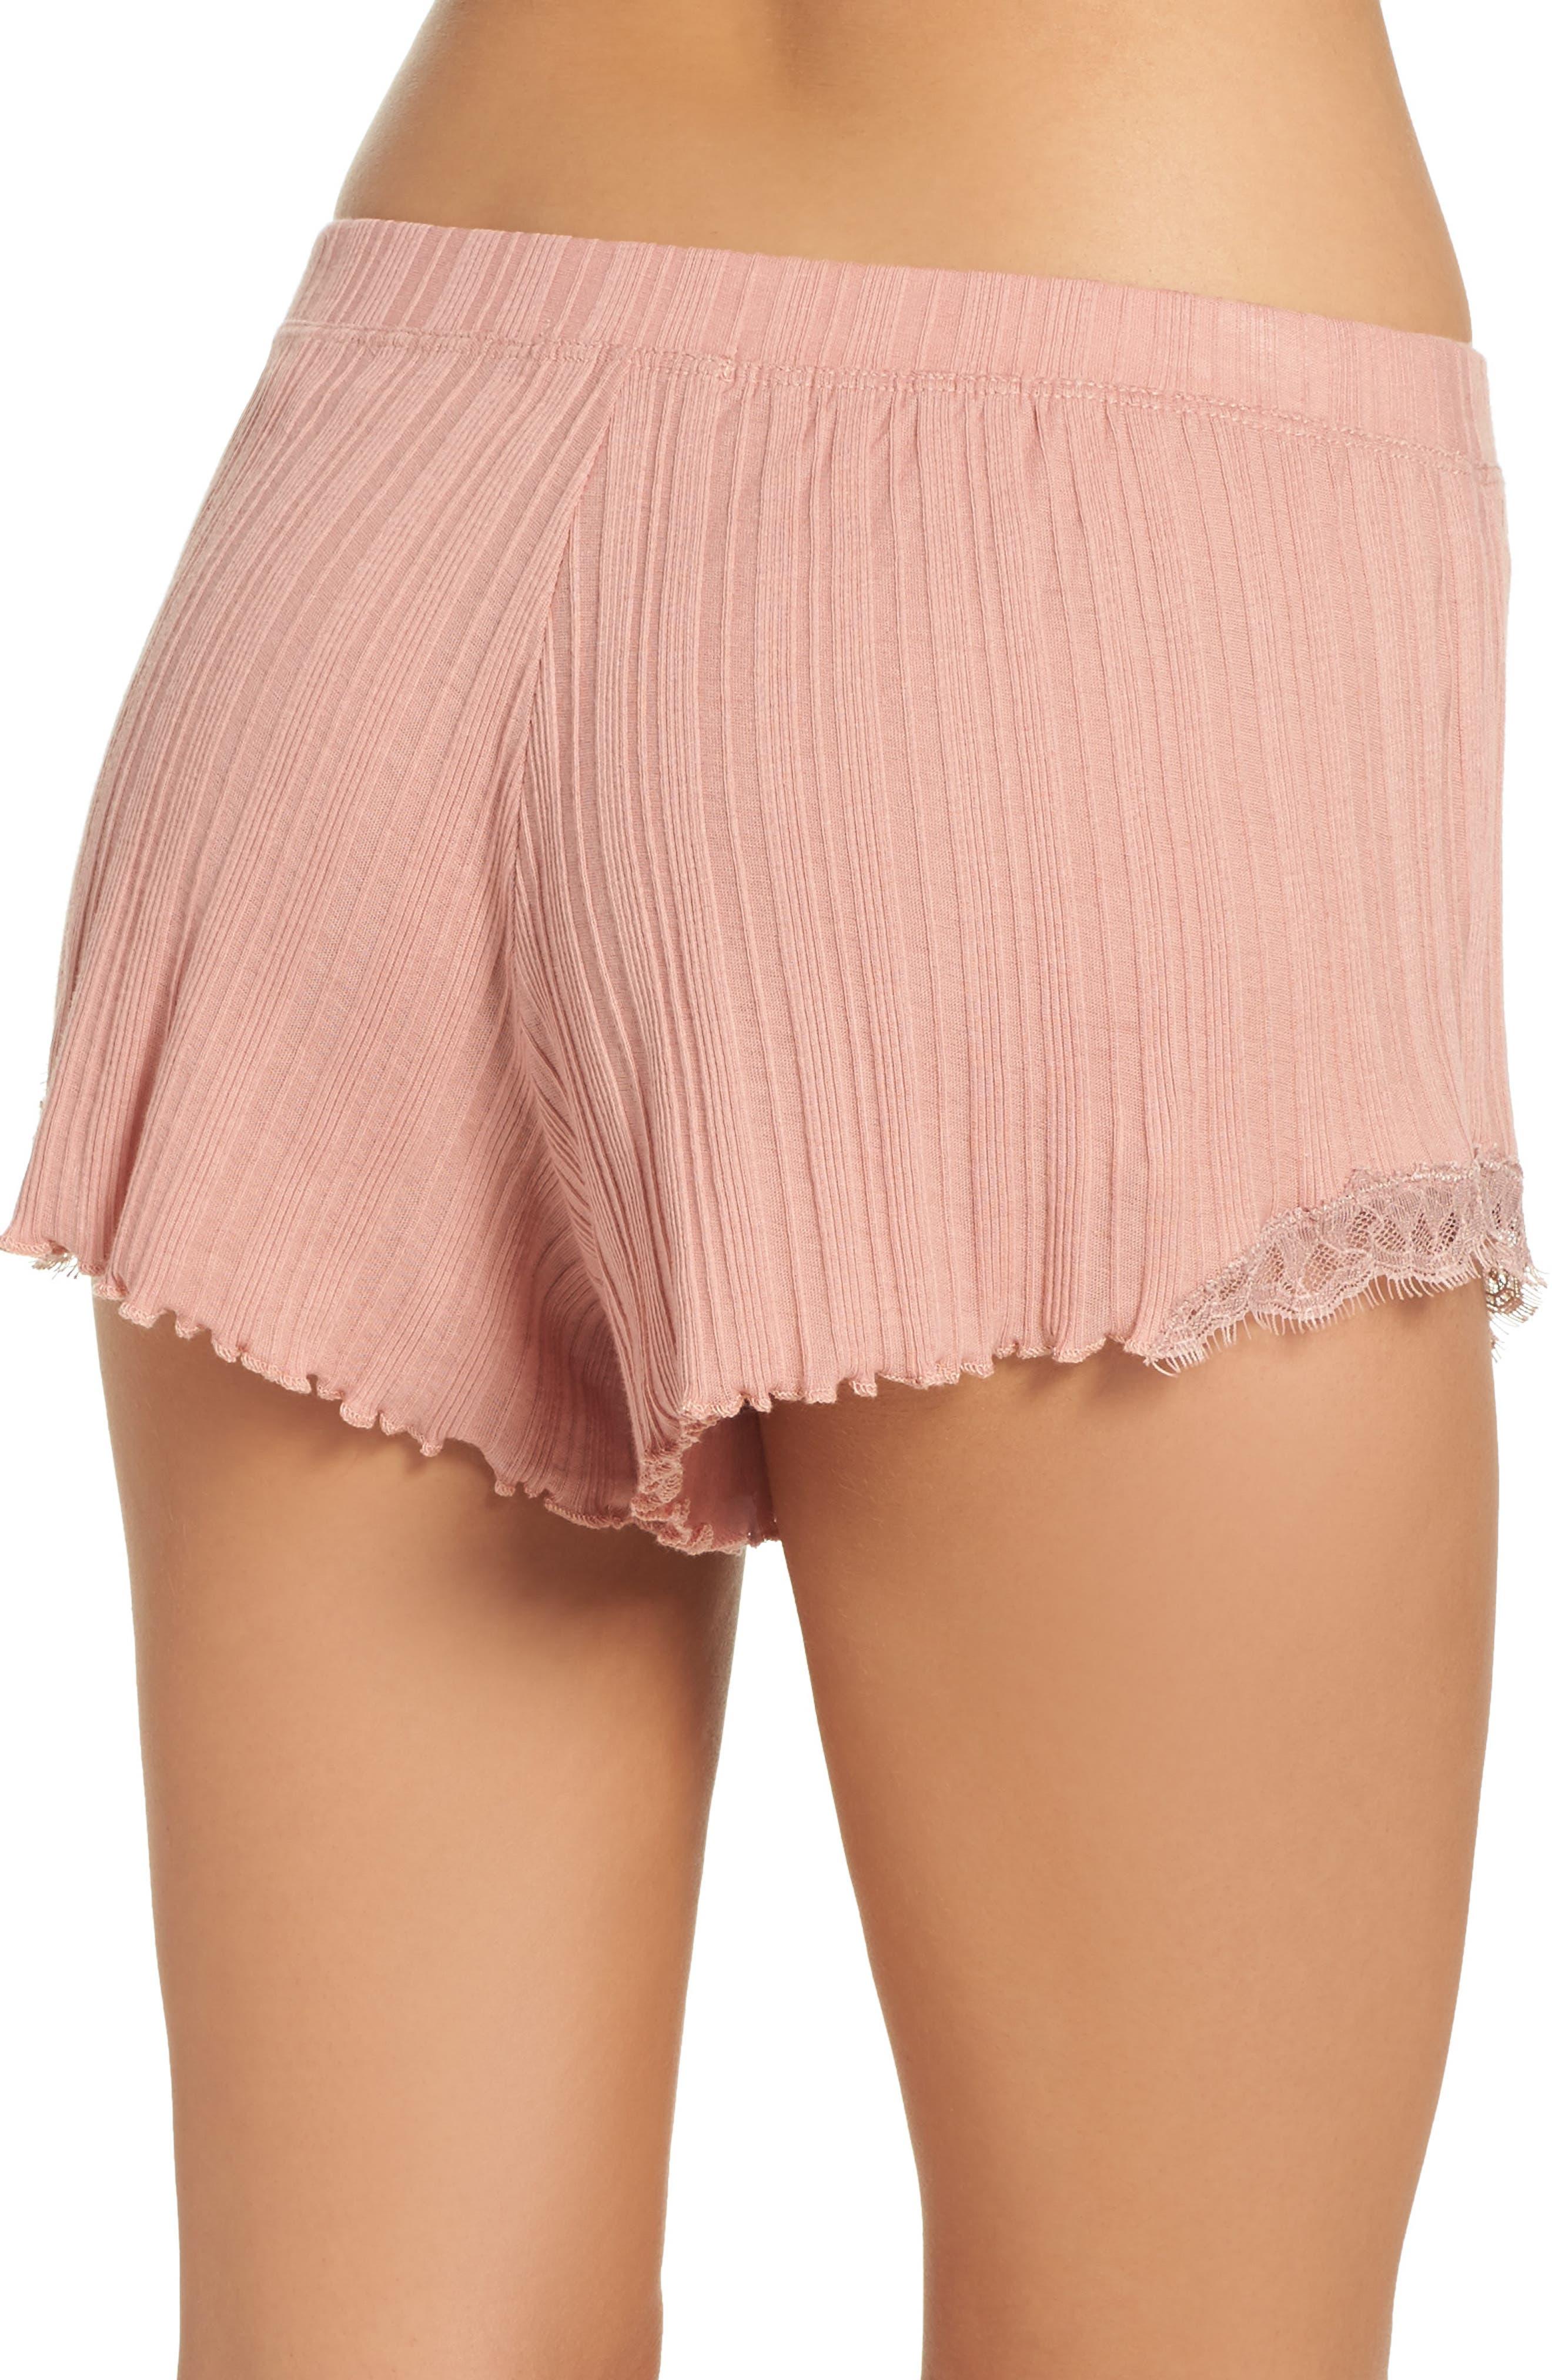 Ribbed Shorts,                             Alternate thumbnail 2, color,                             Vintage Pink